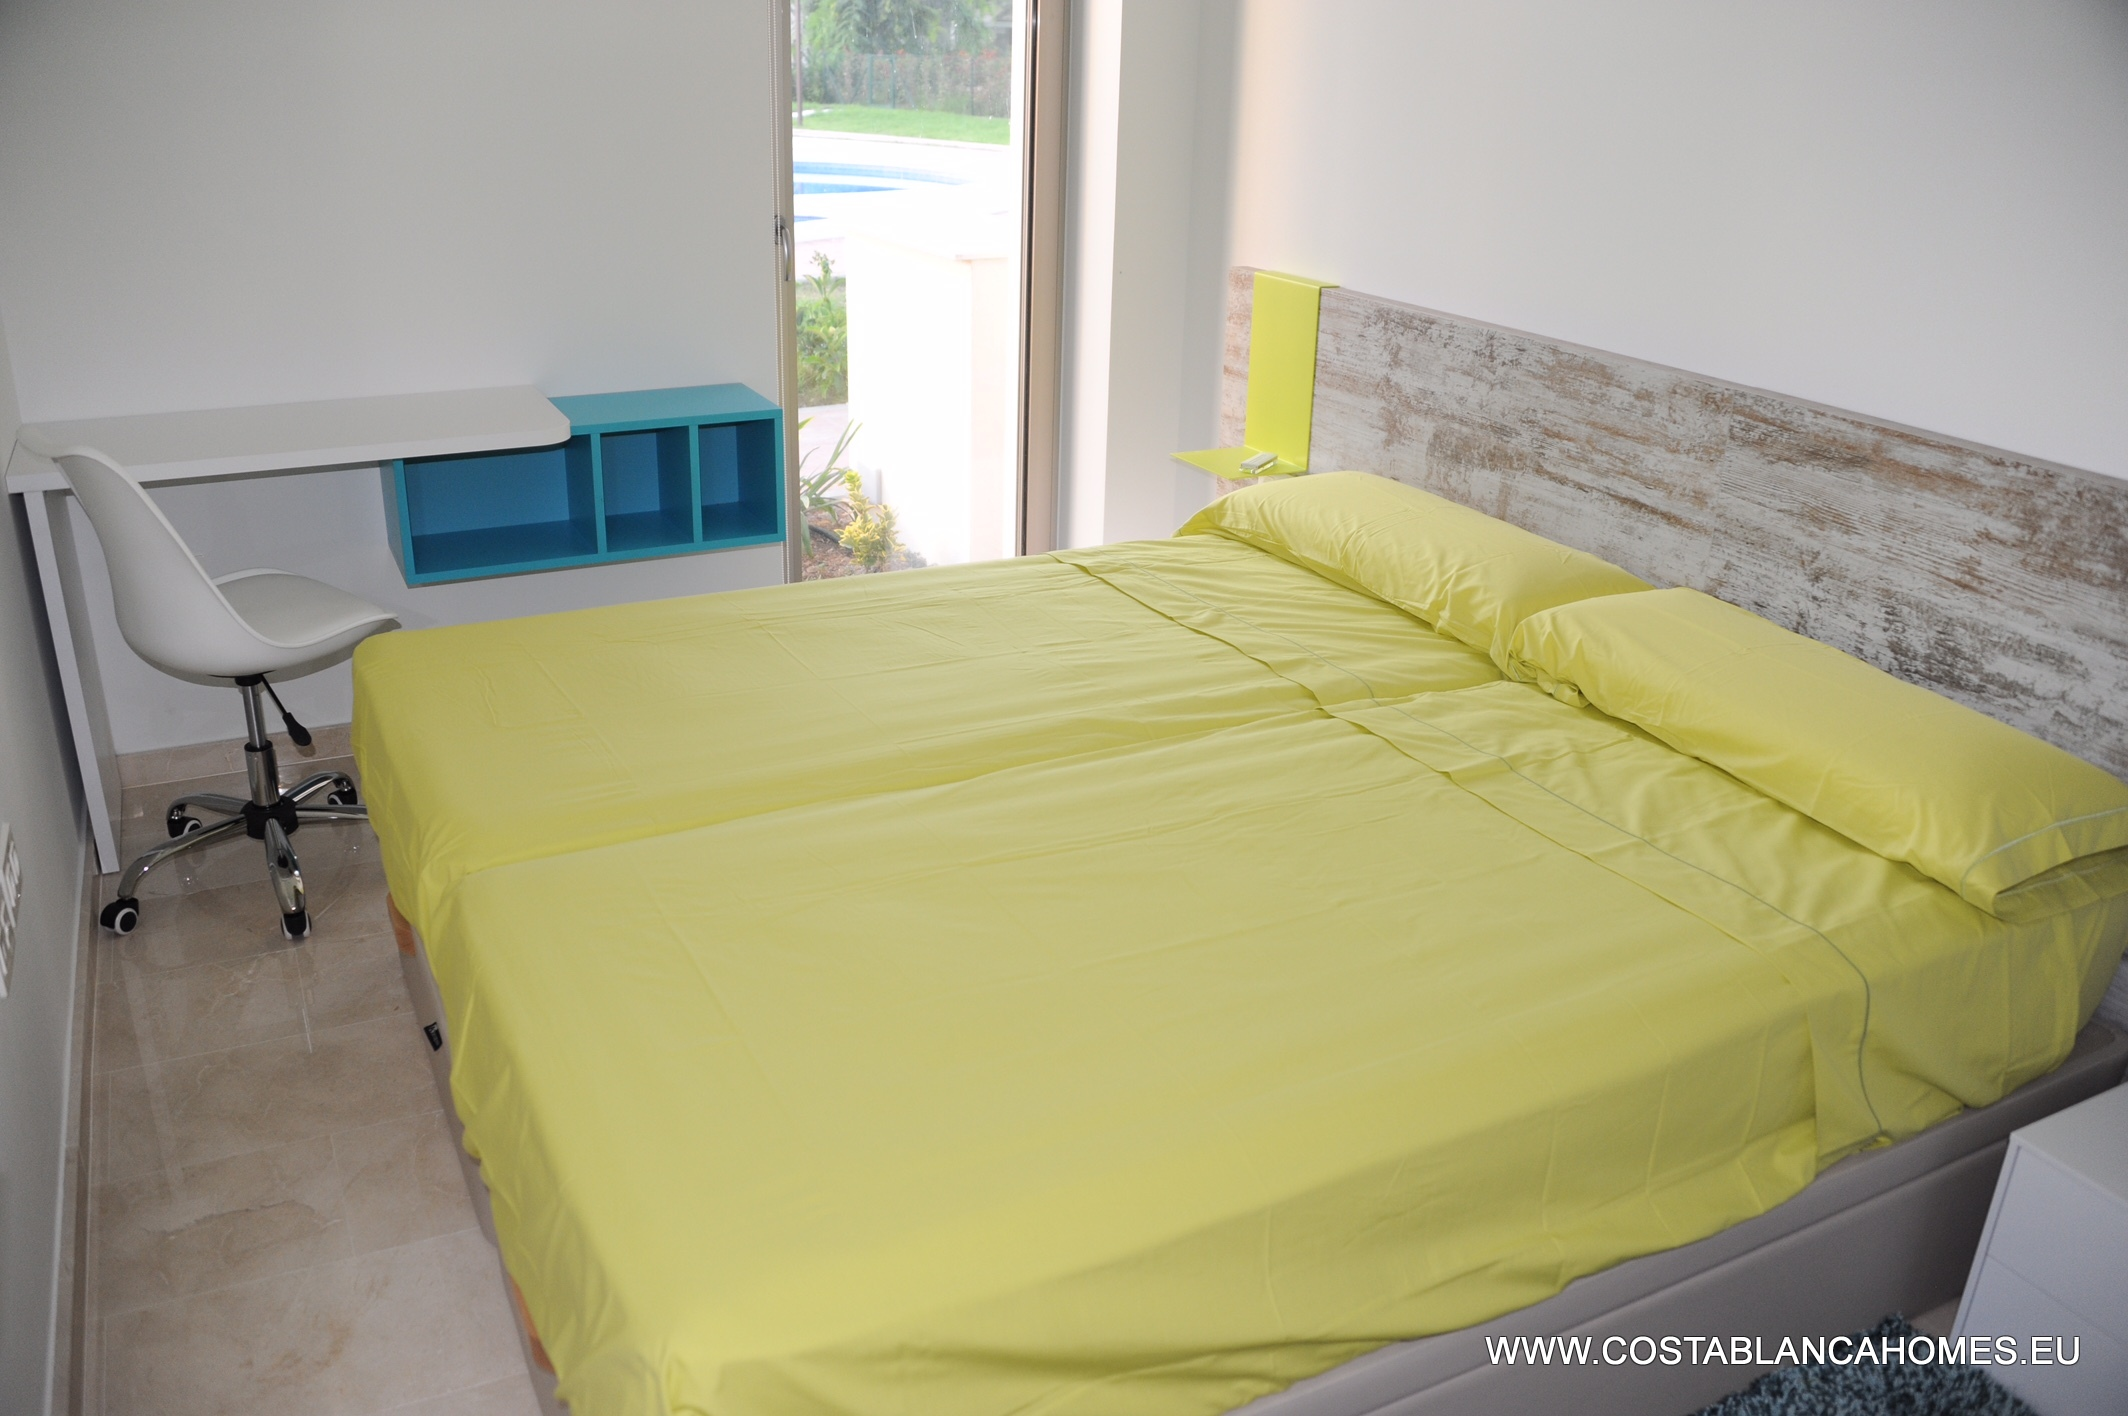 Villajoyosa villa r 210 costa blanca - Vliegtuig badkamer m ...